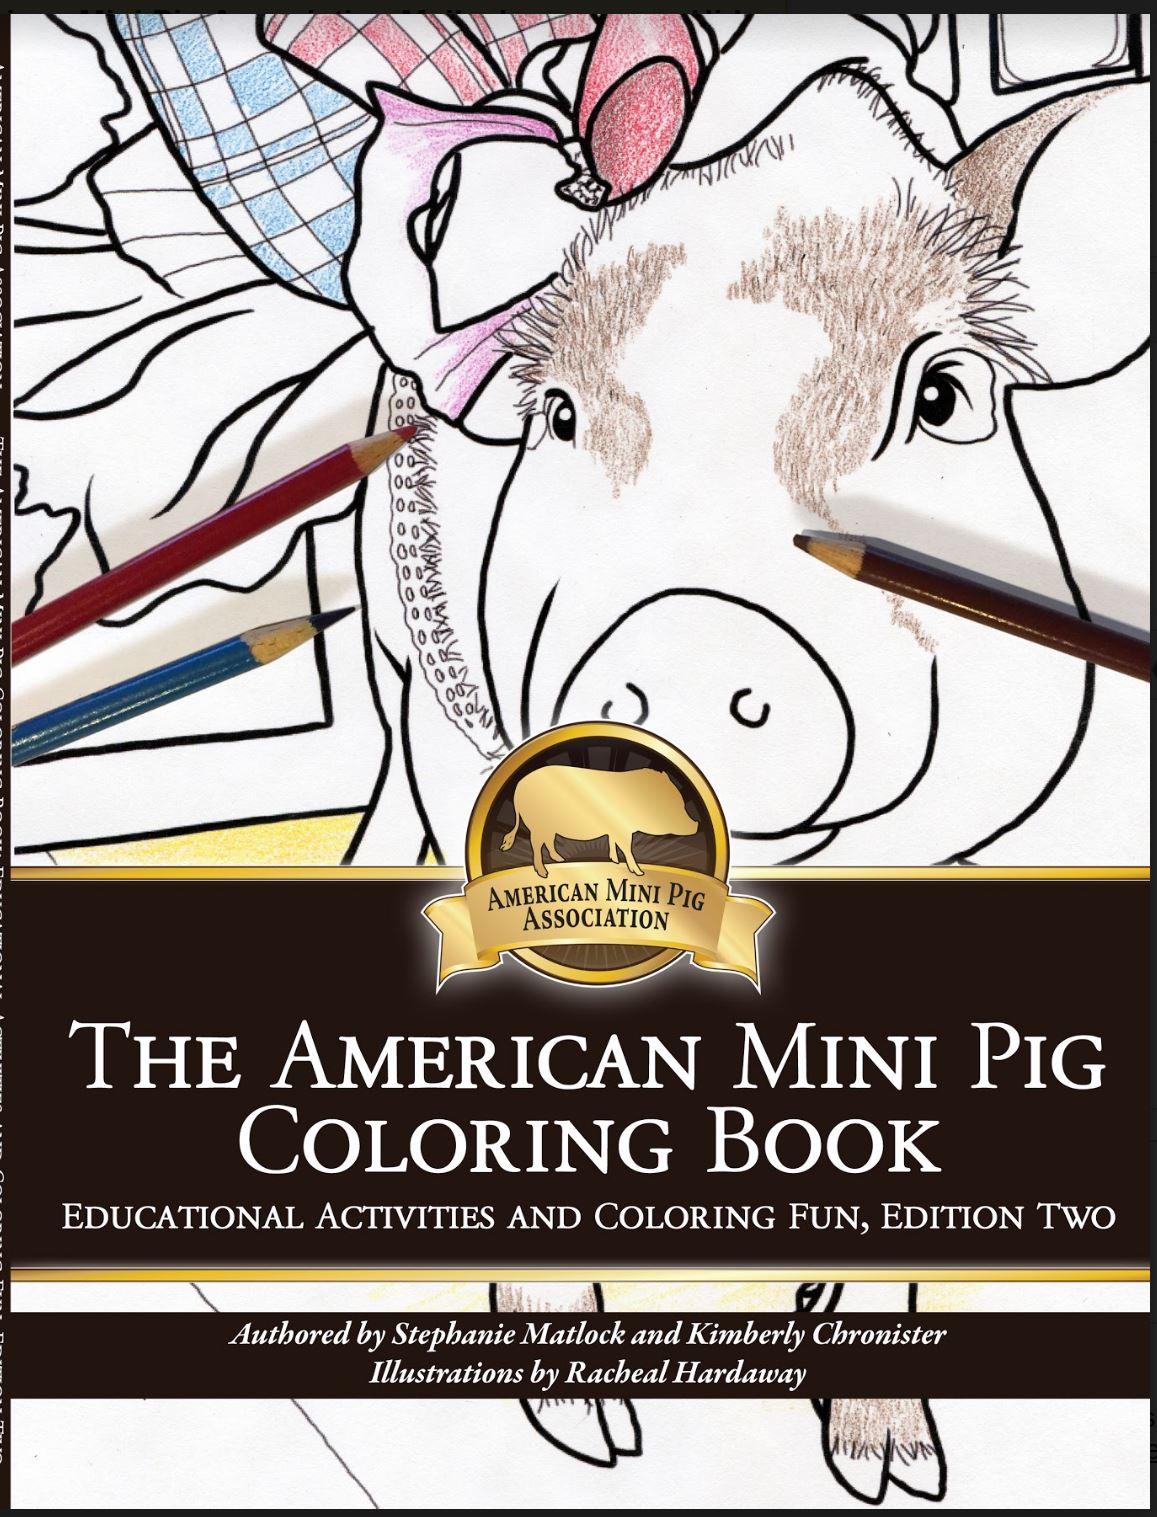 THE AMERICAN MINI PIG COLORING BOOK SERIES